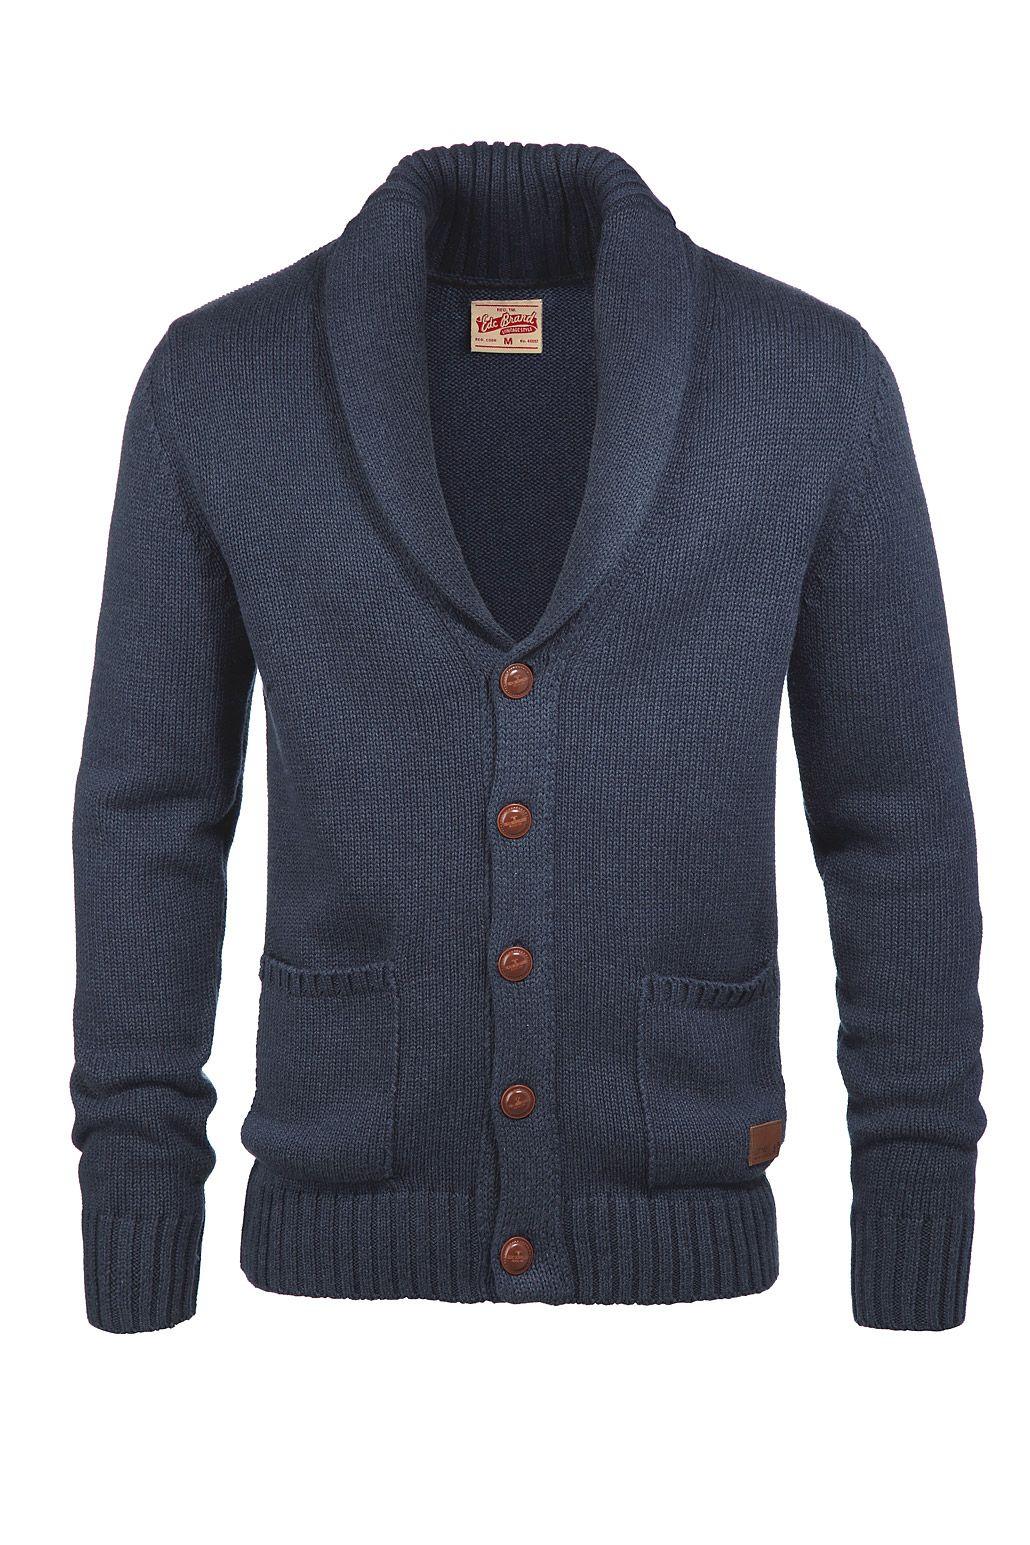 Pin auf Men's Fashion and Clothing